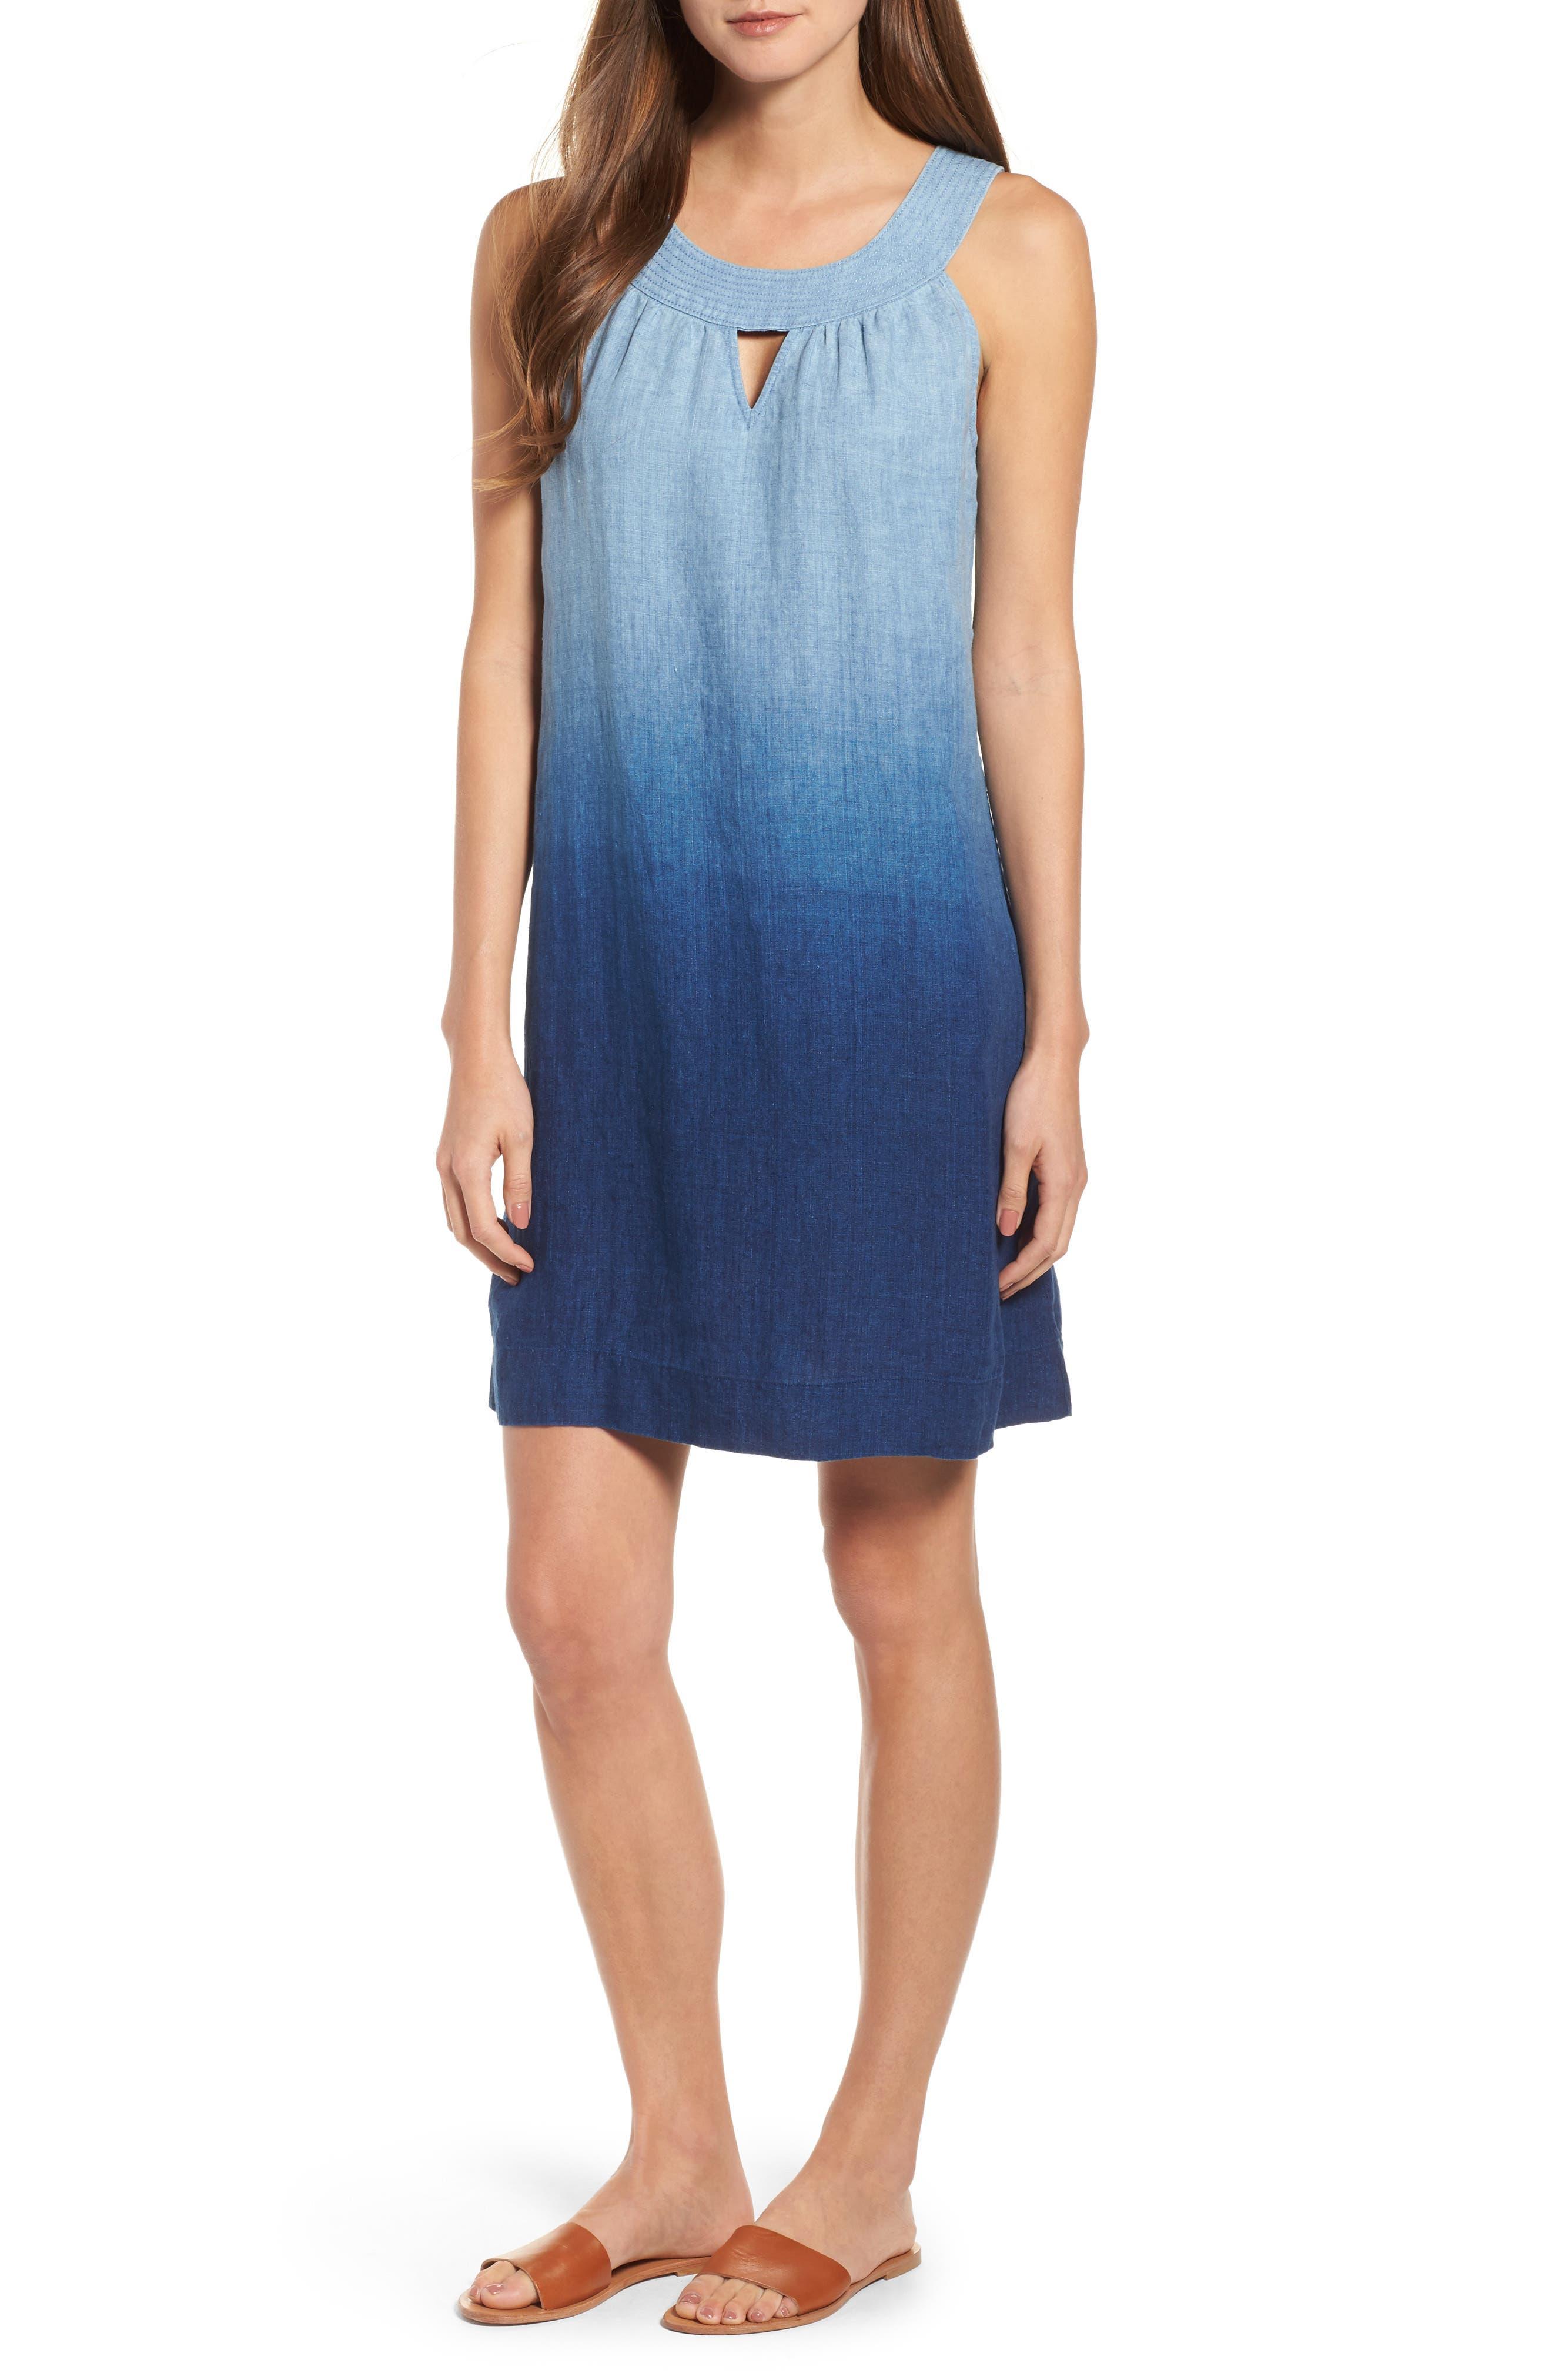 Indigo Dip Dyed Shift Dress,                         Main,                         color, Dark Indigo Wash